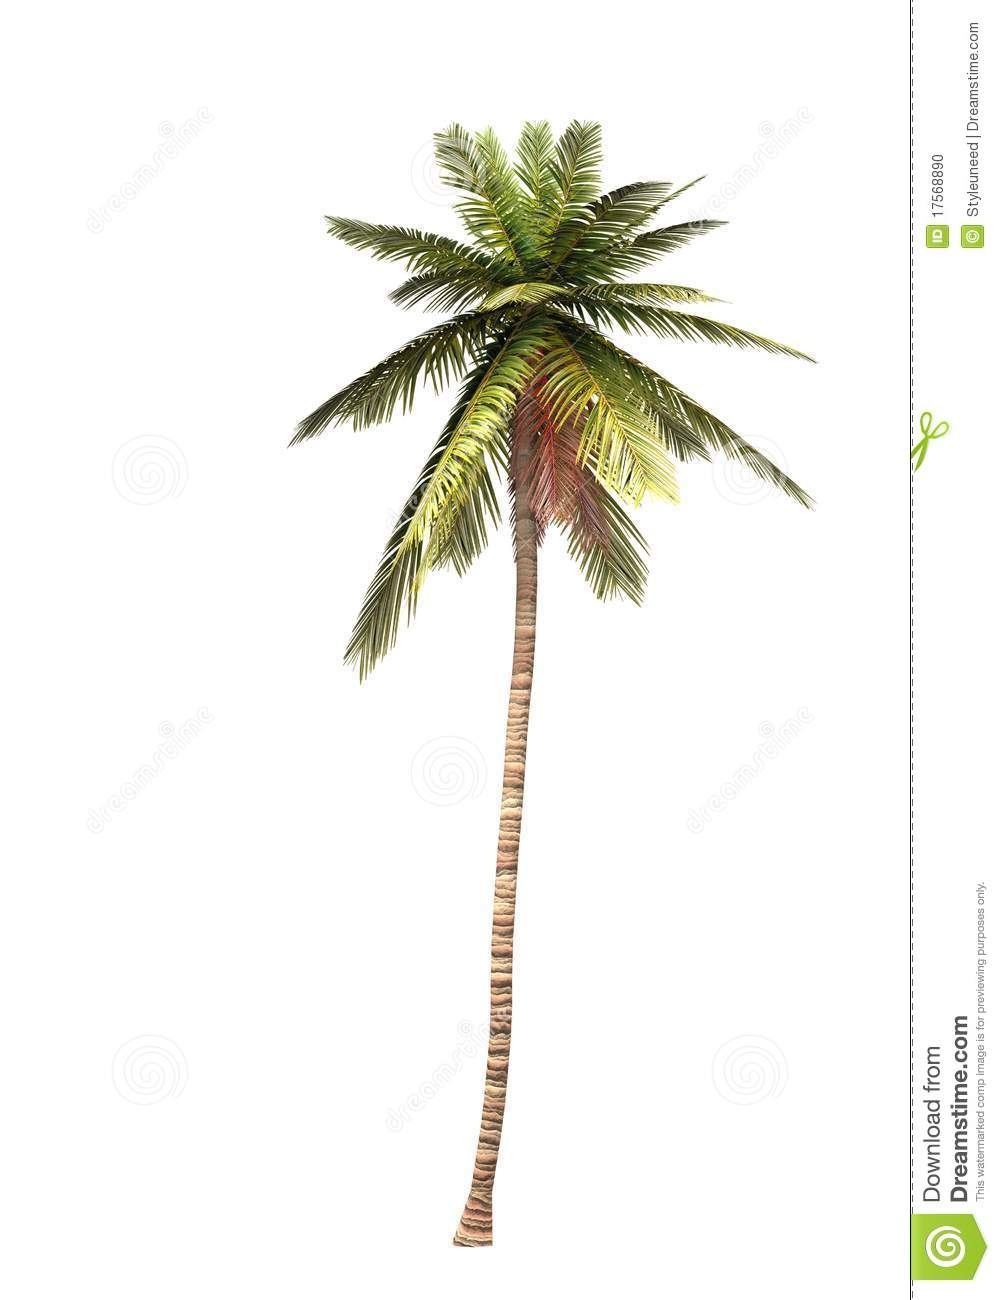 Trunk clipart coconut tree #10